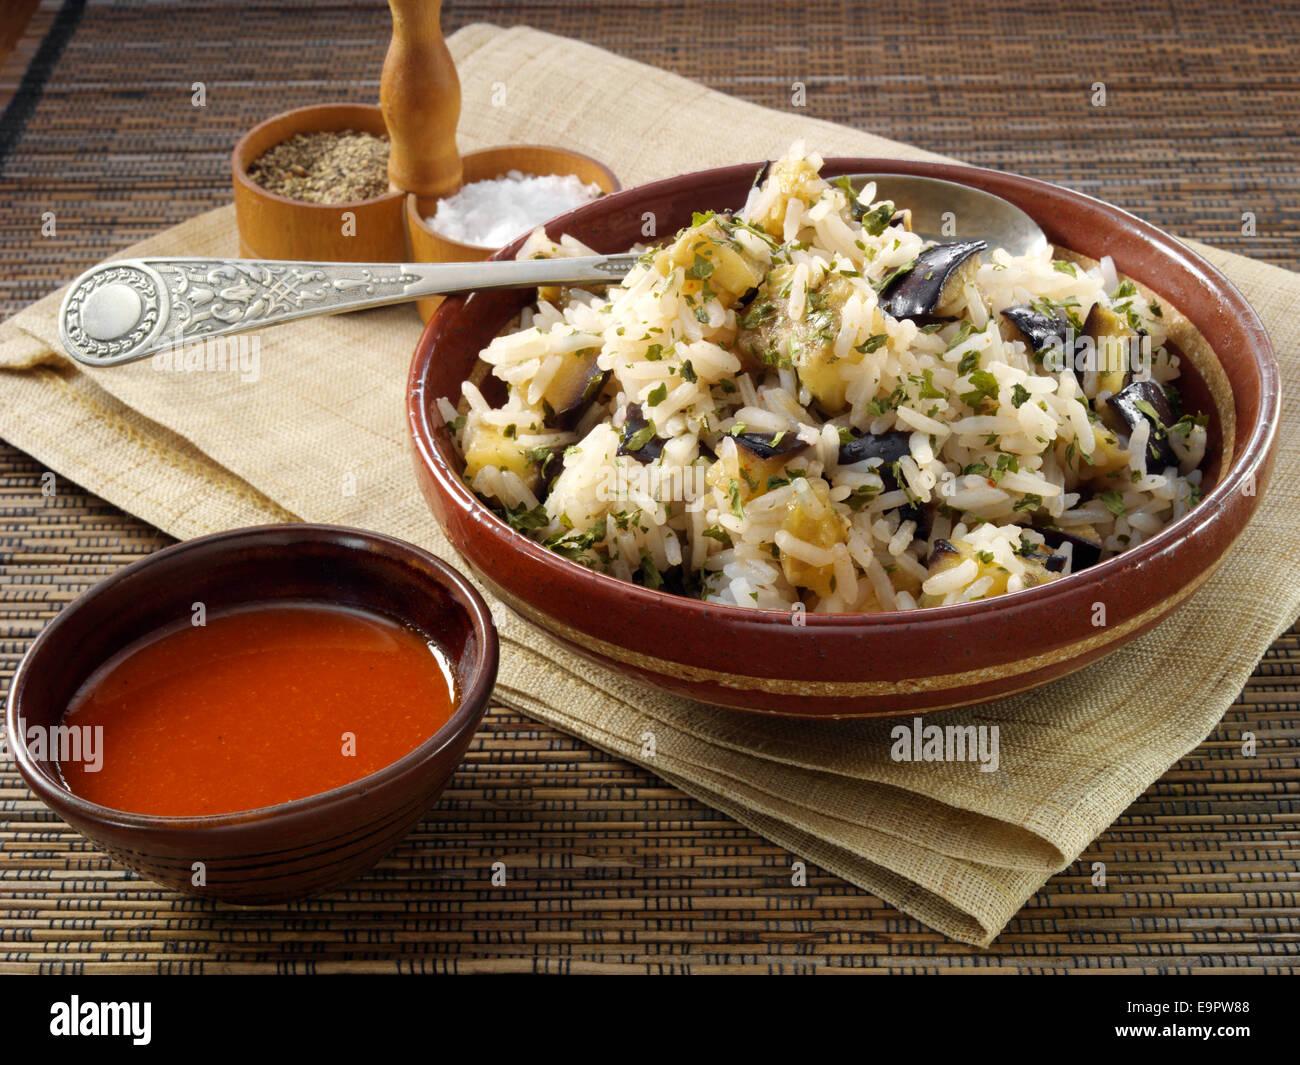 Sriracha and honey eggplant rice - Stock Image